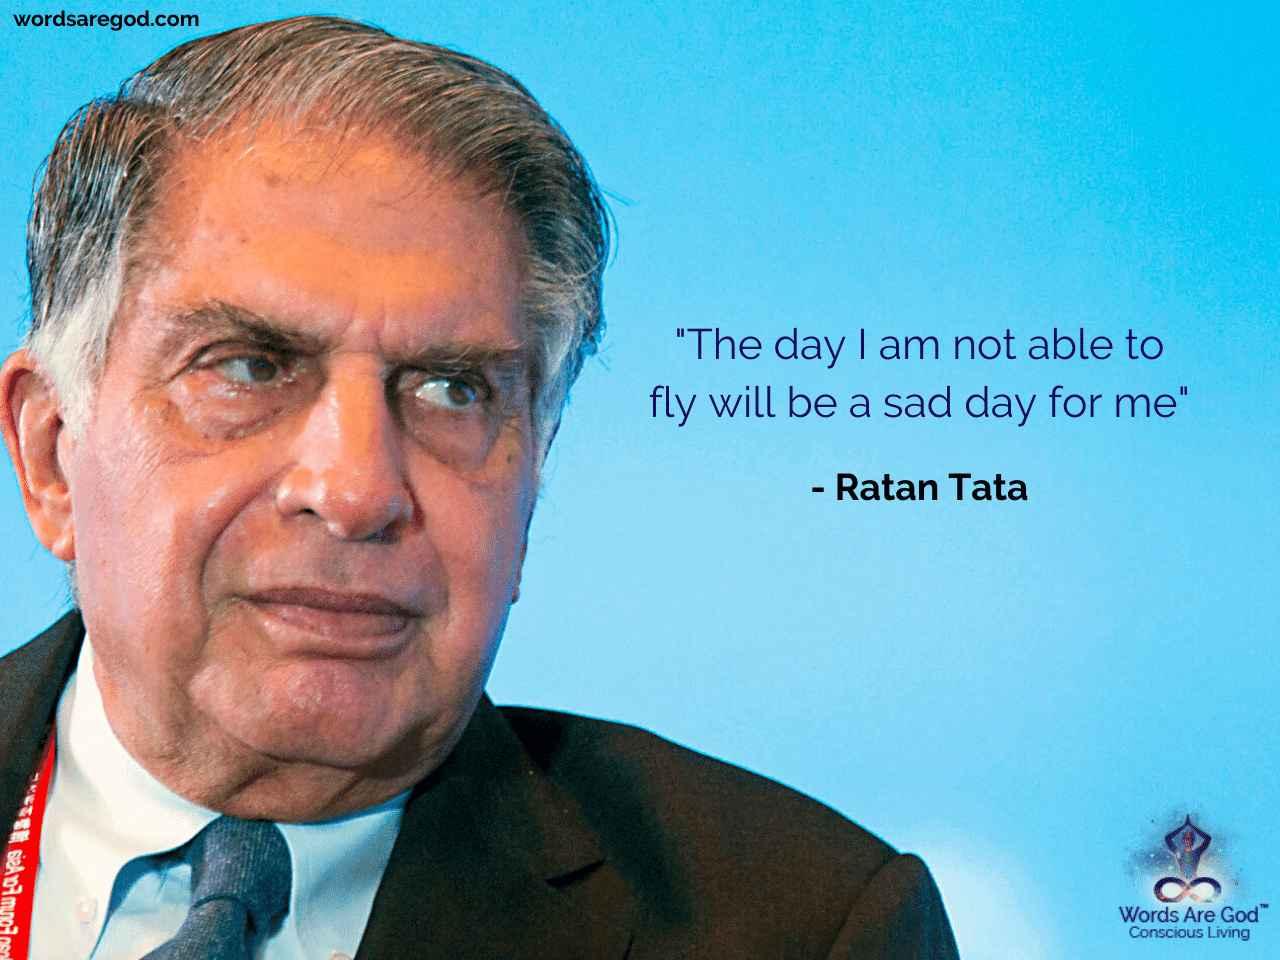 Ratan Tata Inspirational Quote by Ratan Tata